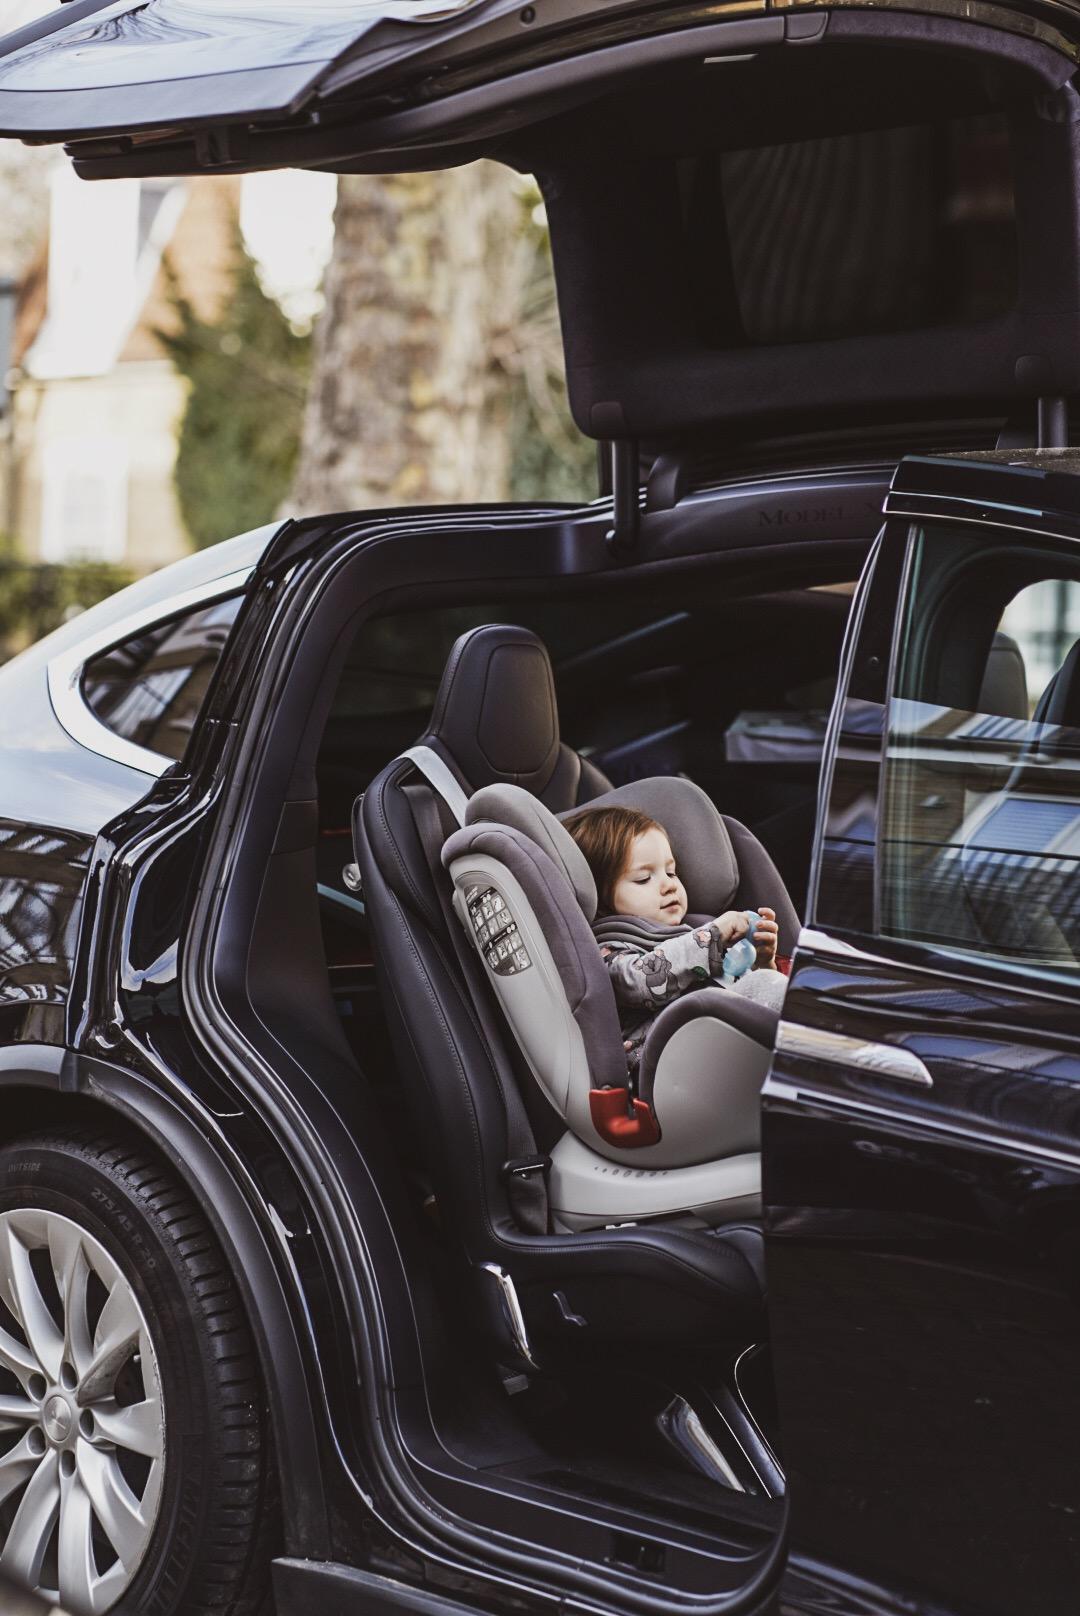 apramo carseat motherhood travel with children road trip